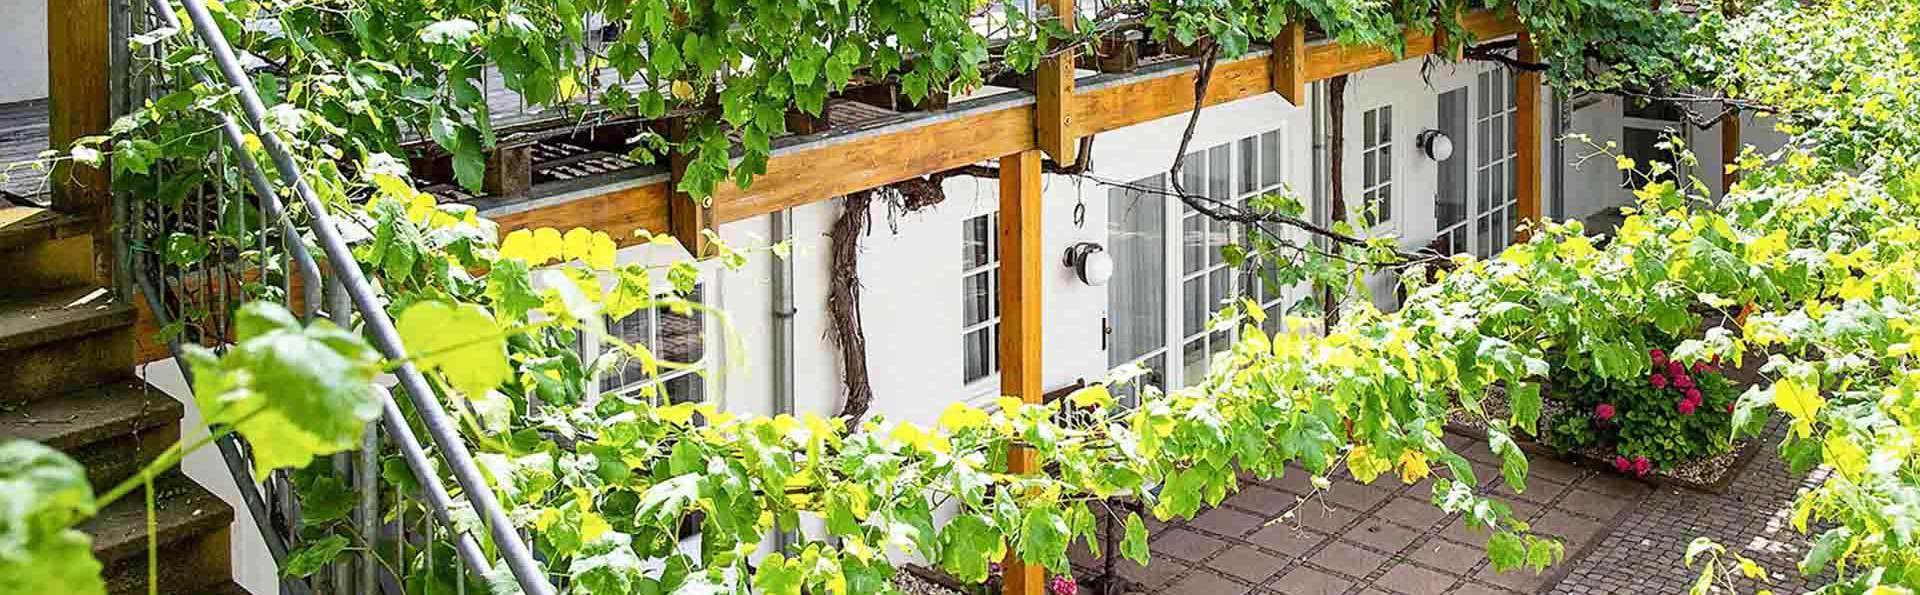 Halbersbacher Hotel Annaberg - EDIT_annaberg-nebengebaeude_01.jpg